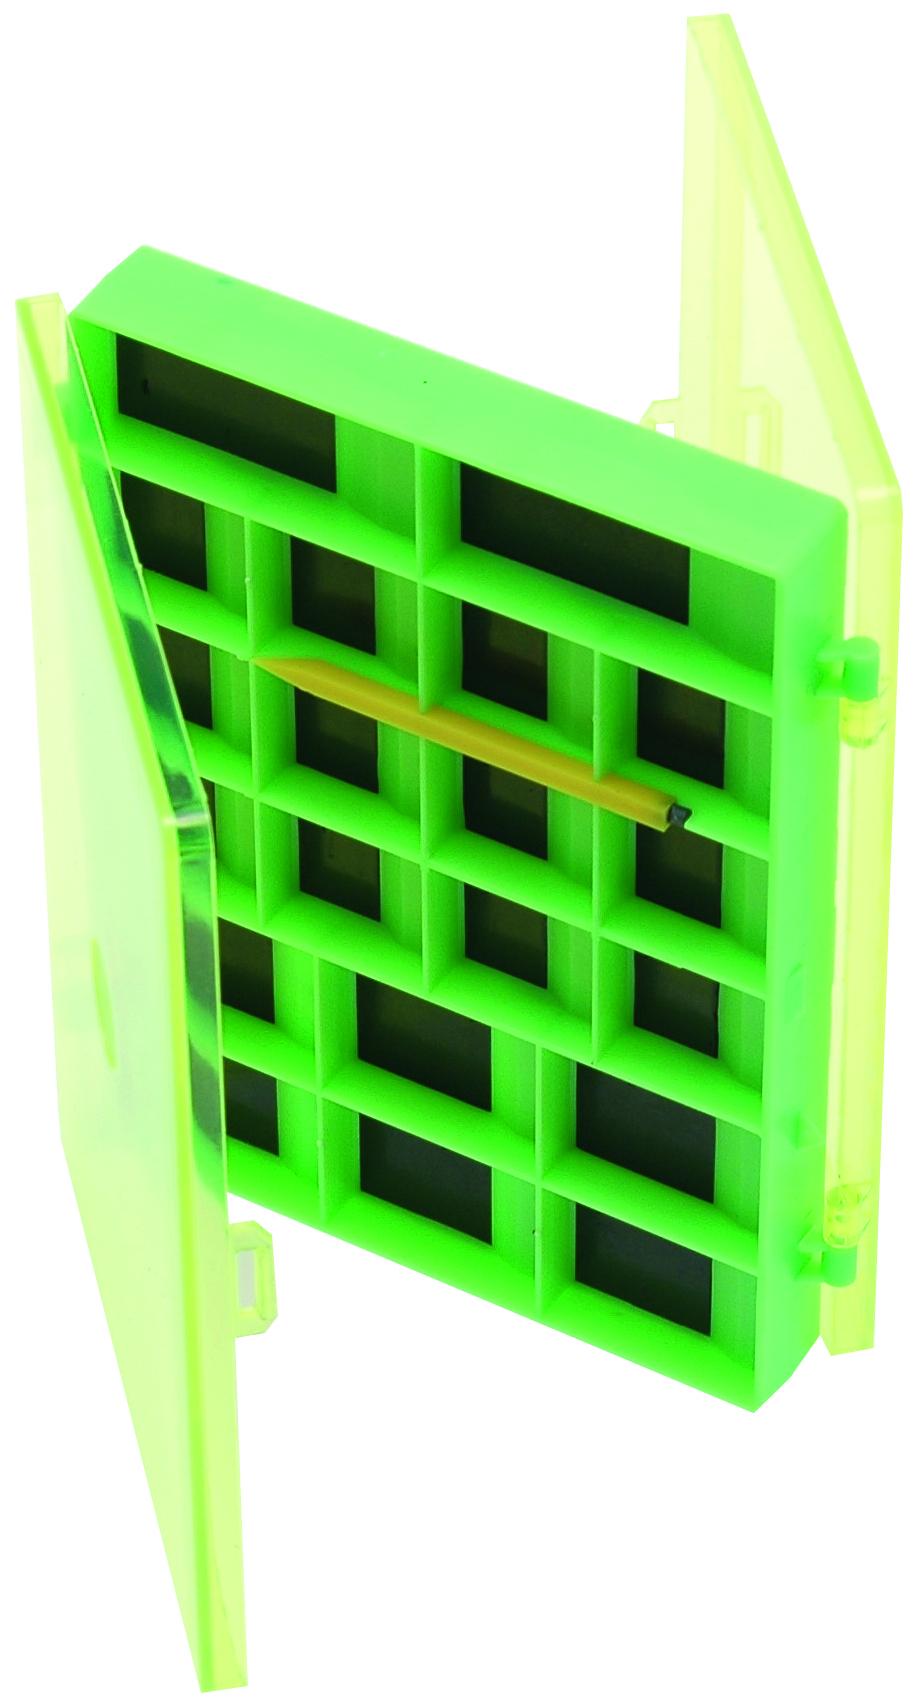 Krabička magnetická 1 rozměr krabičky: 120 x 90 x 18 mm